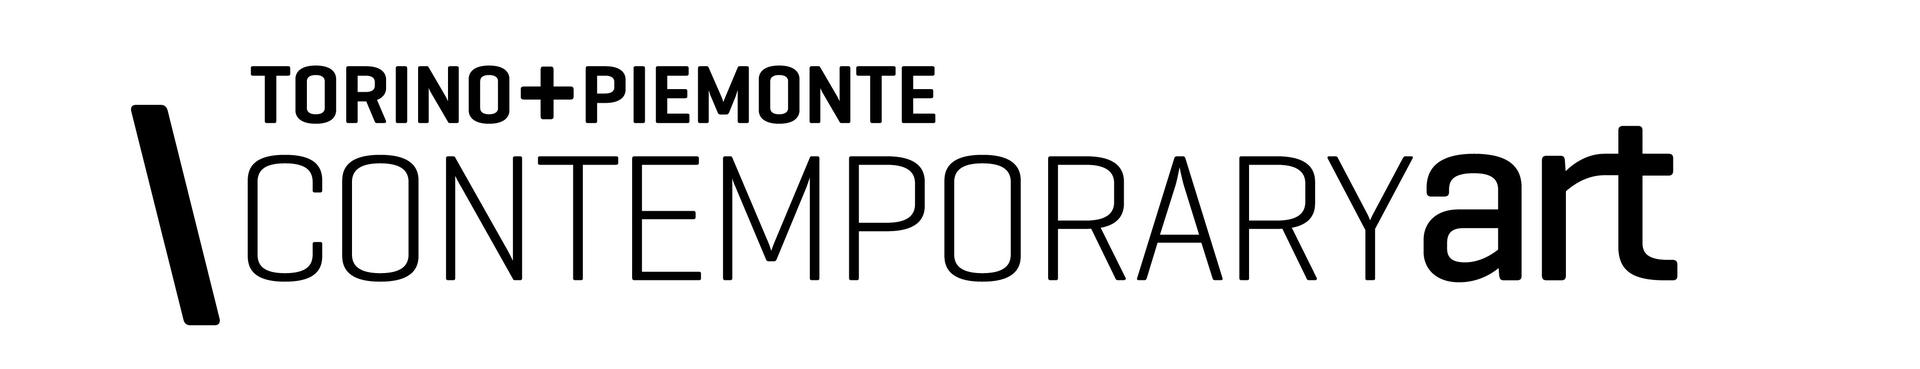 Contemporary Art Torino Piemonte